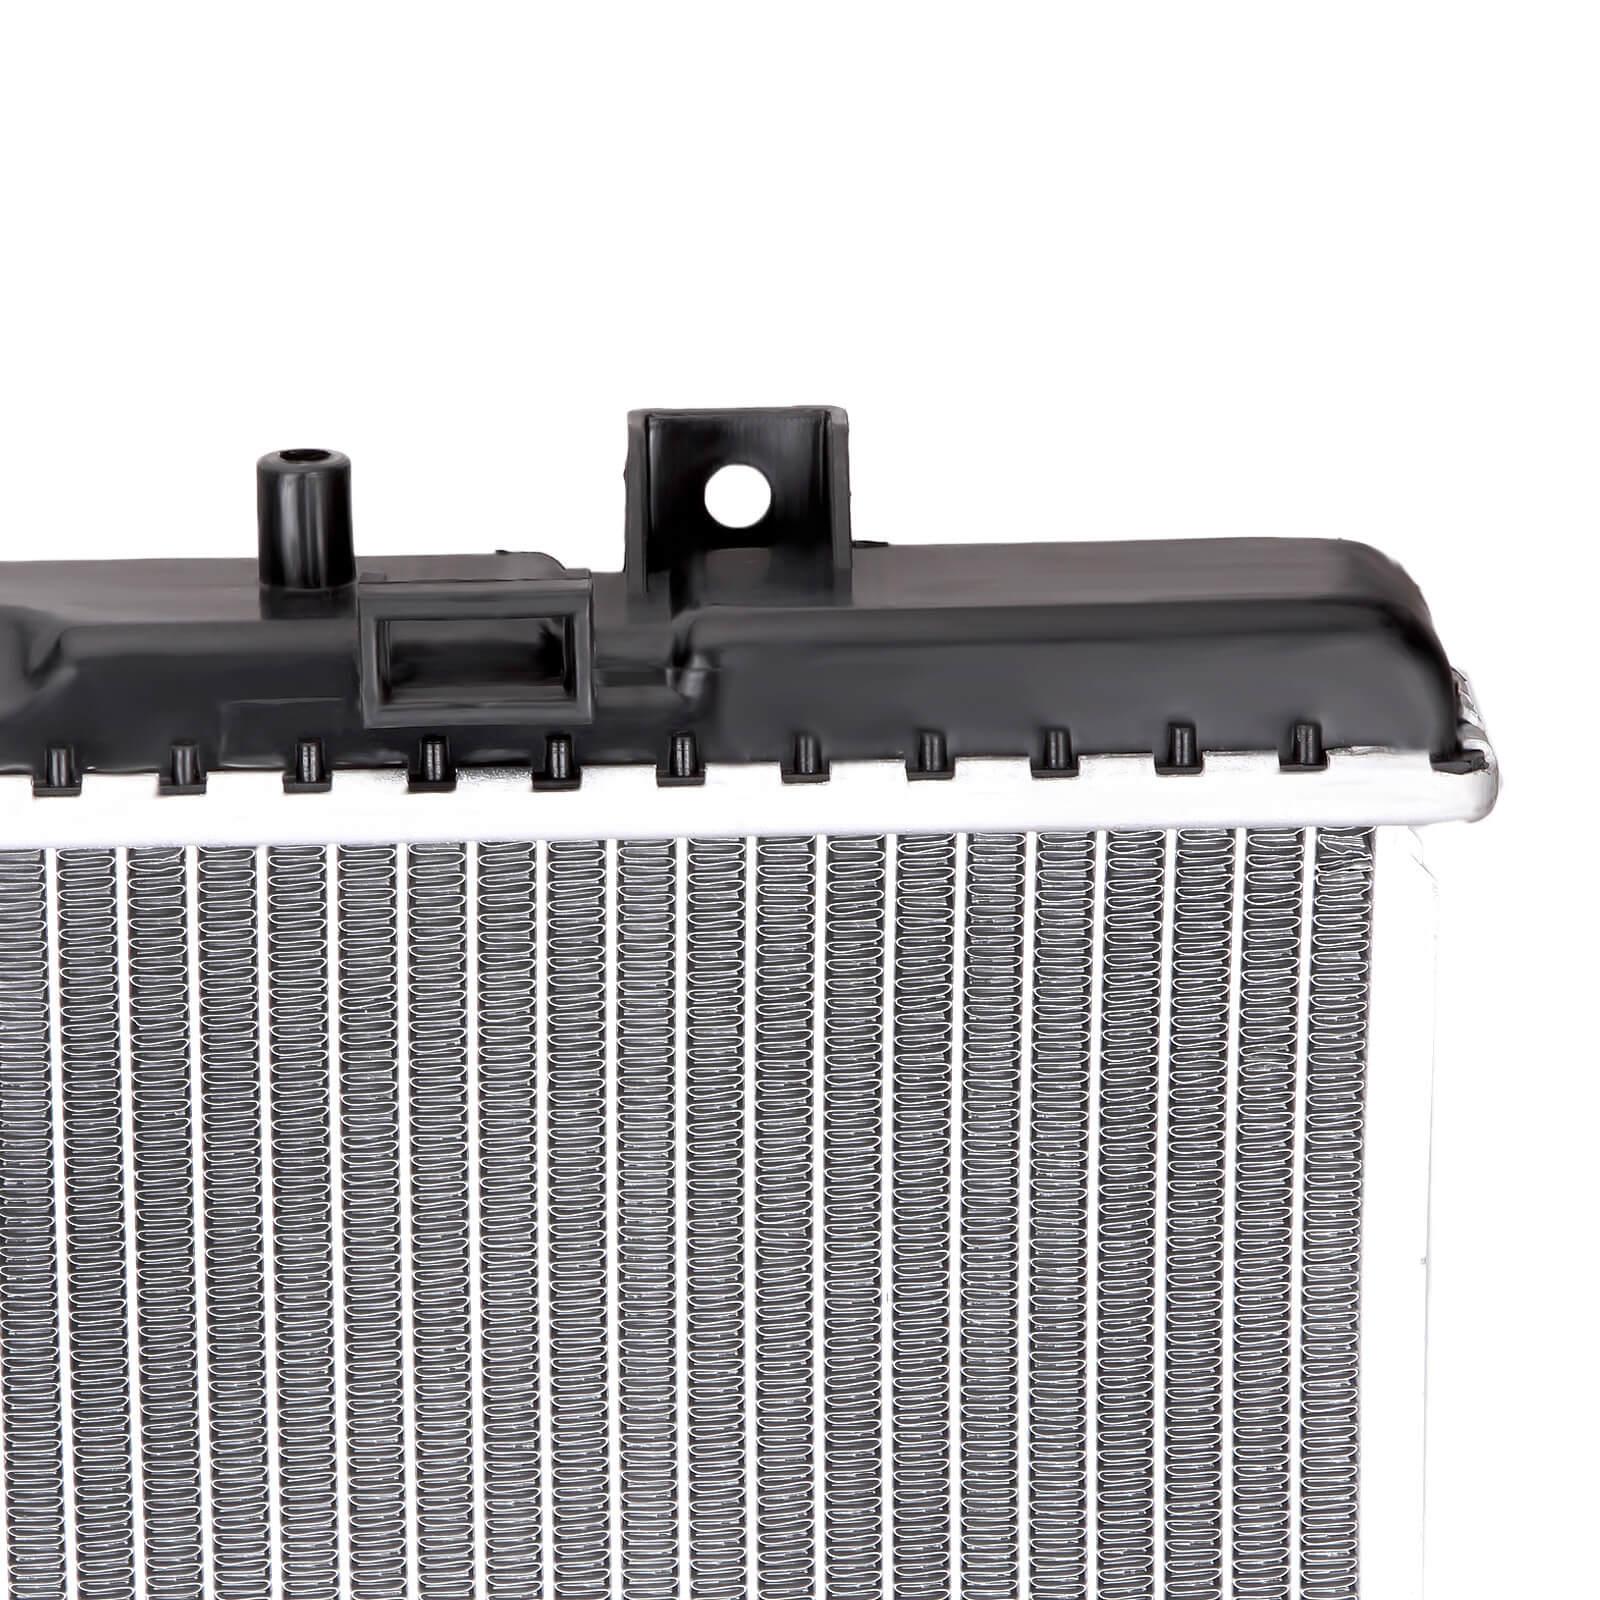 Dromedary Brand sv8sshsv 20042006 vy holden radiators for sale